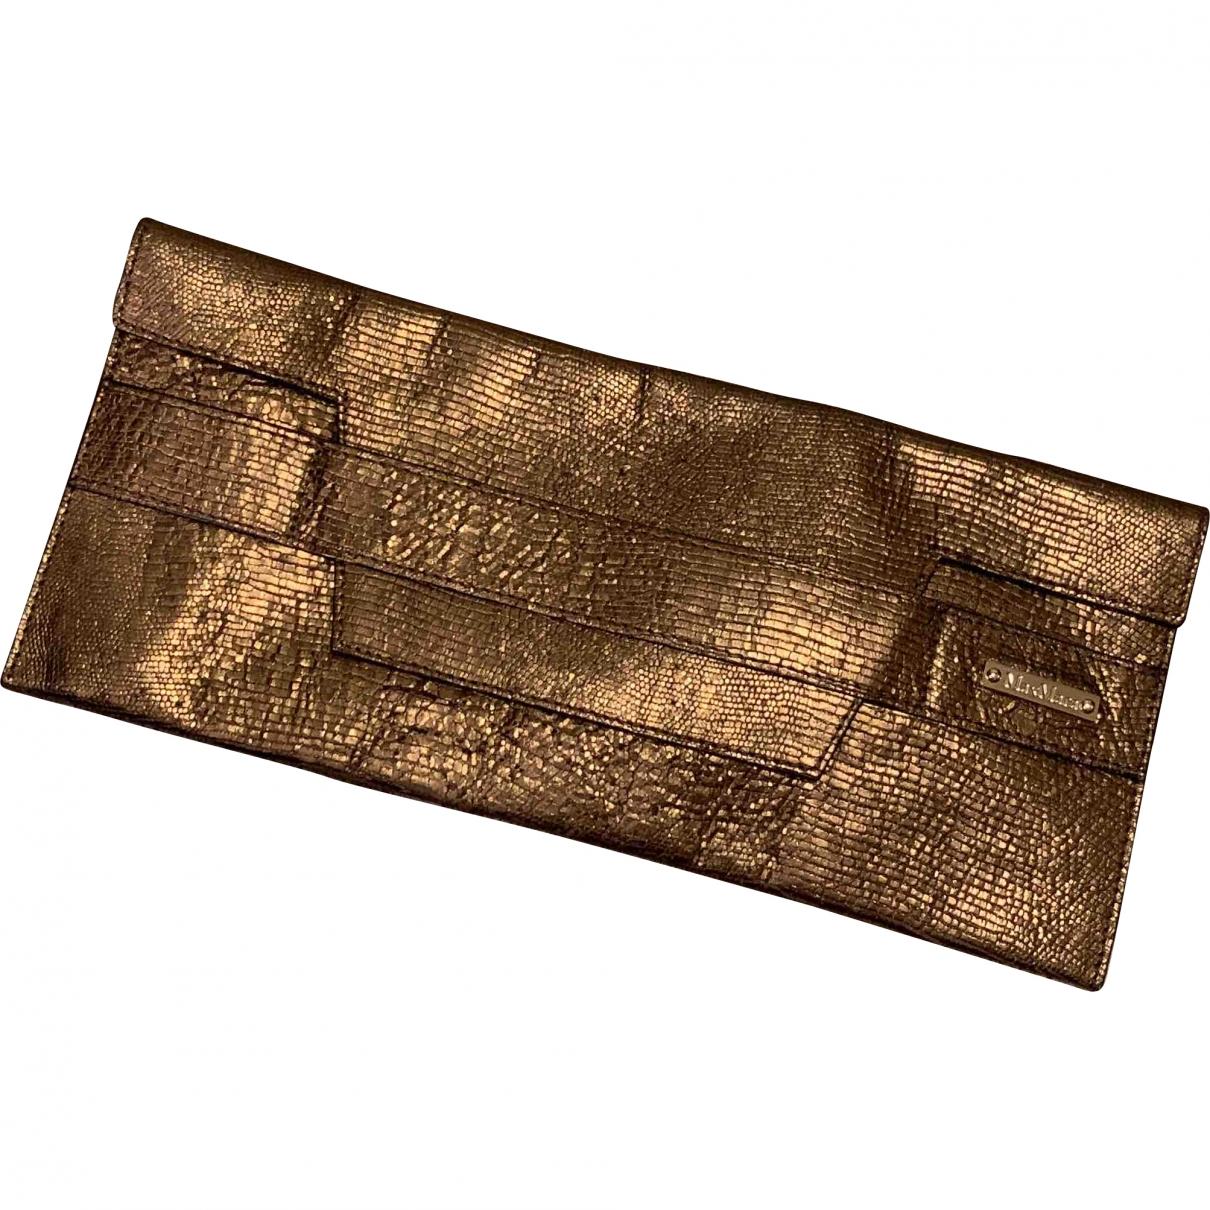 Max Mara \N Metallic Cloth Clutch bag for Women \N